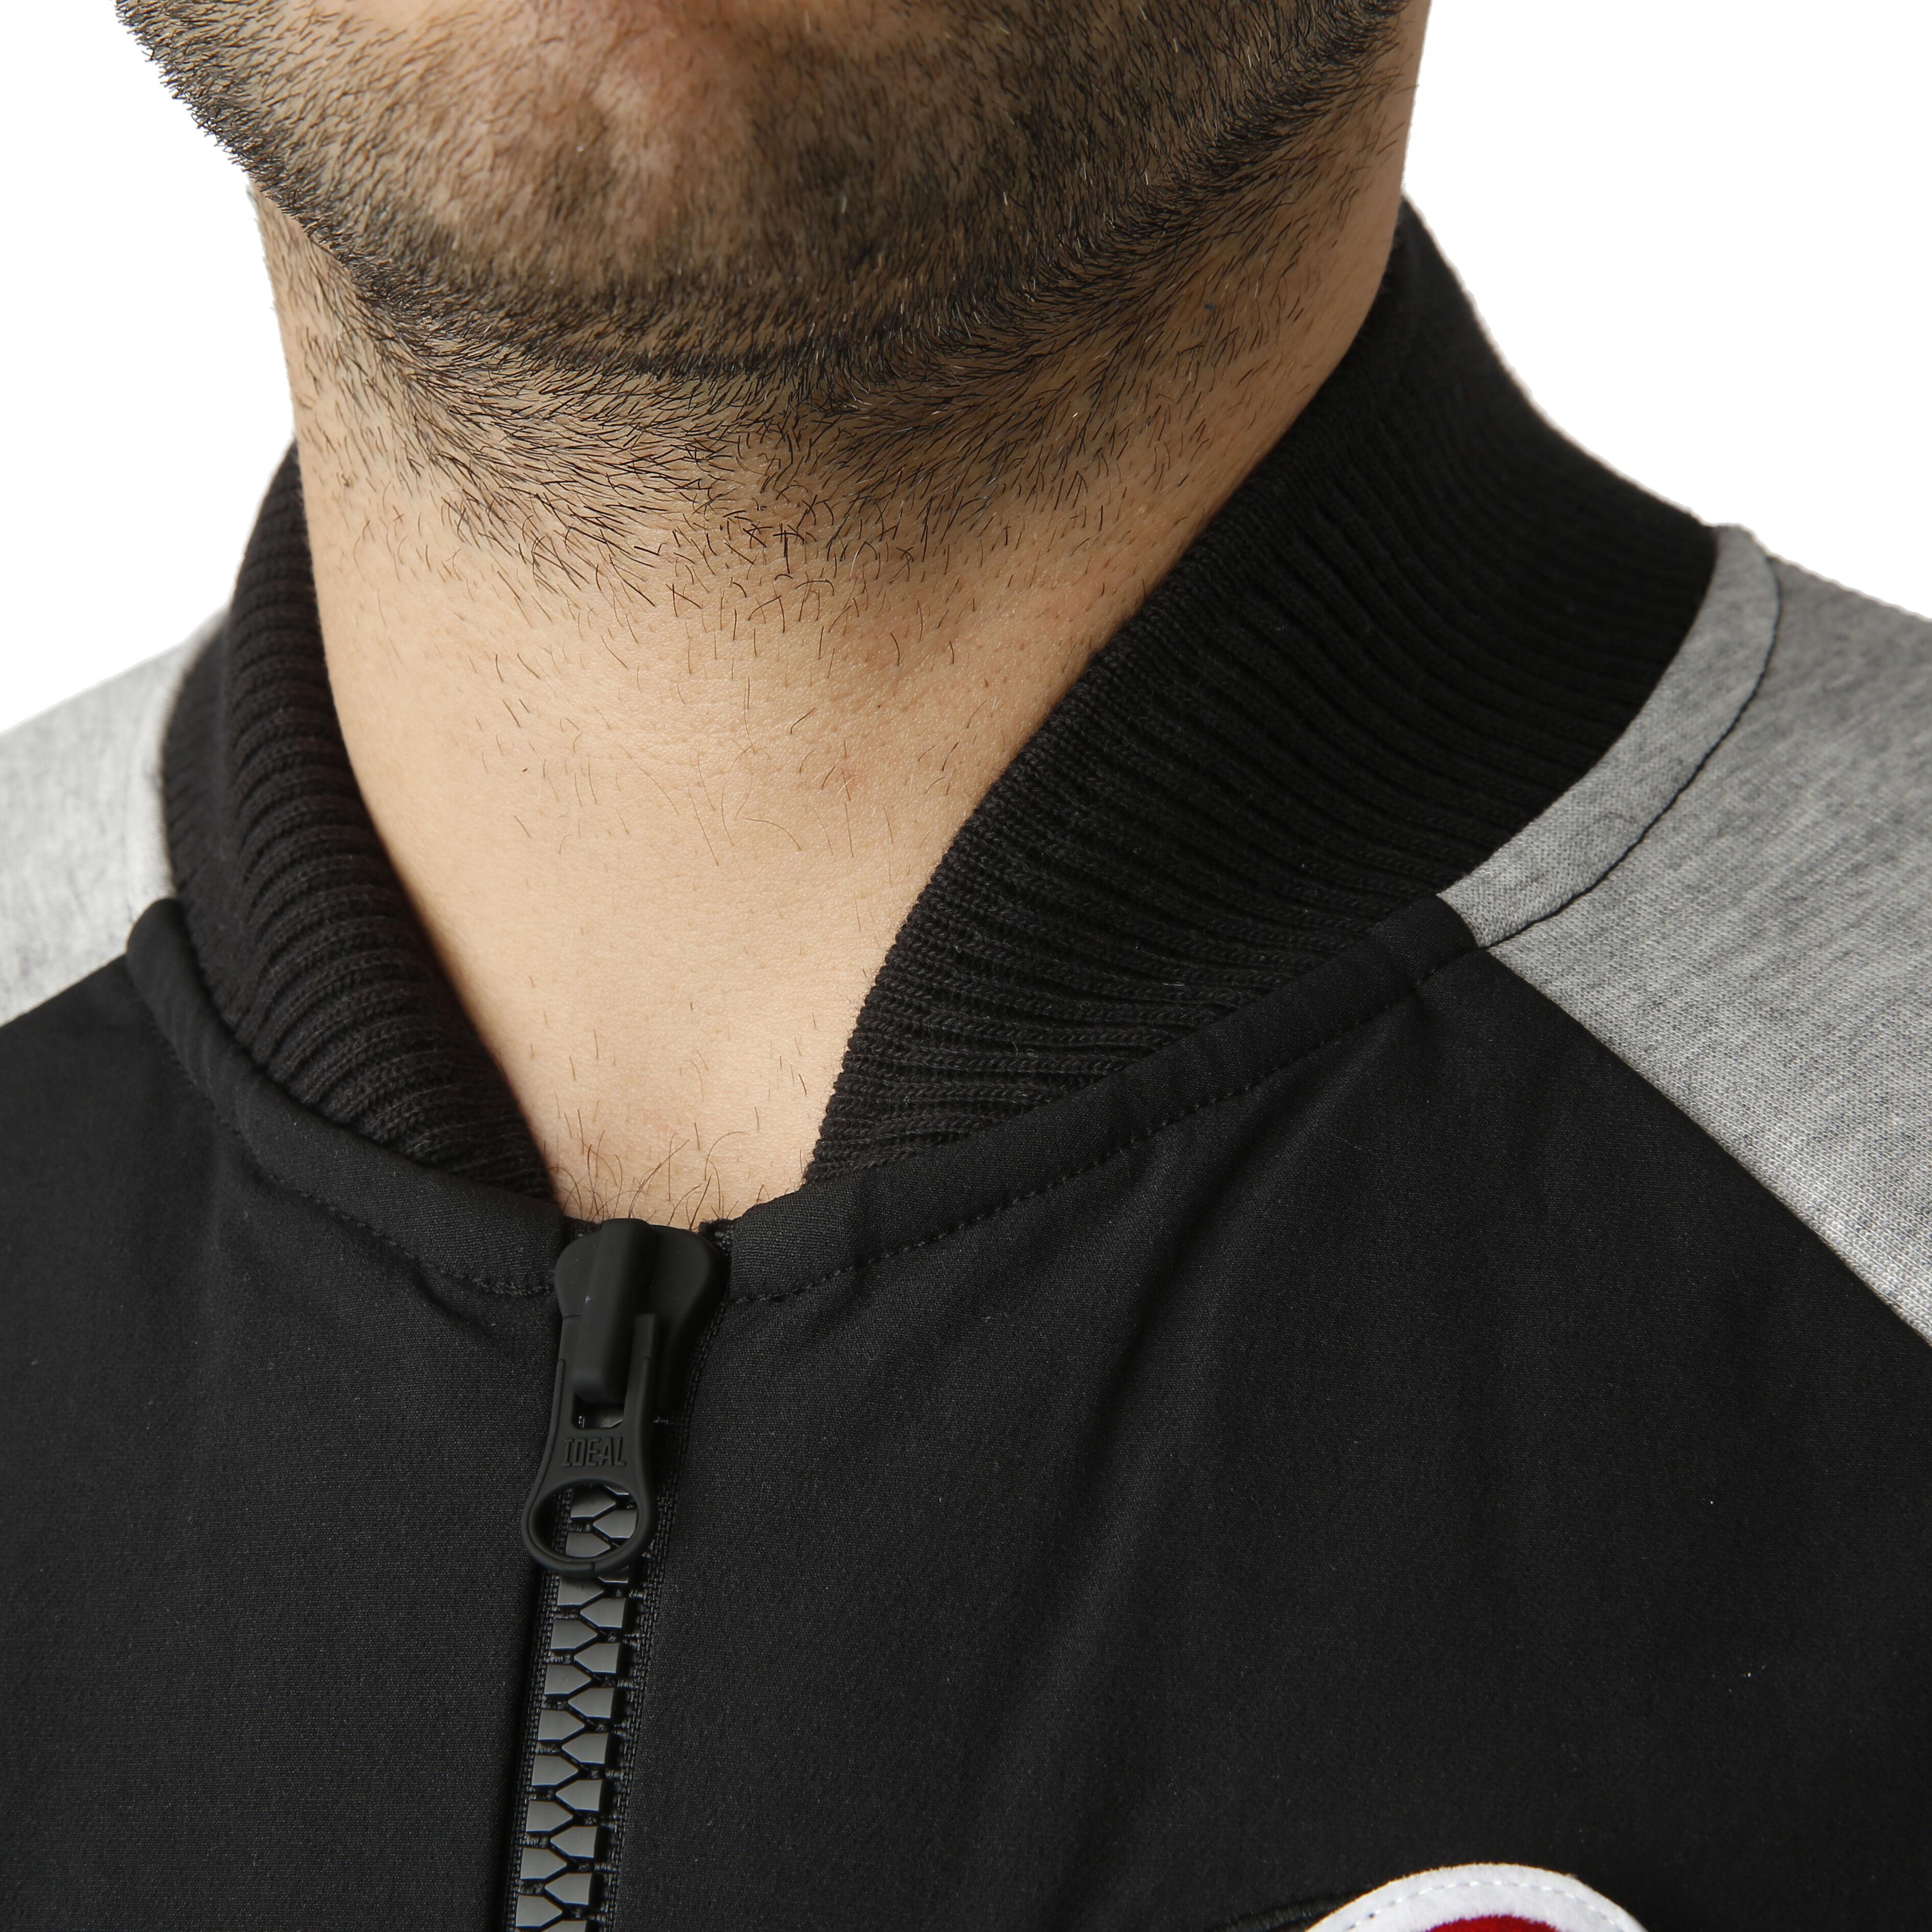 adidas VRCT Trainingsjacke Herren Schwarz, Hellgrau online